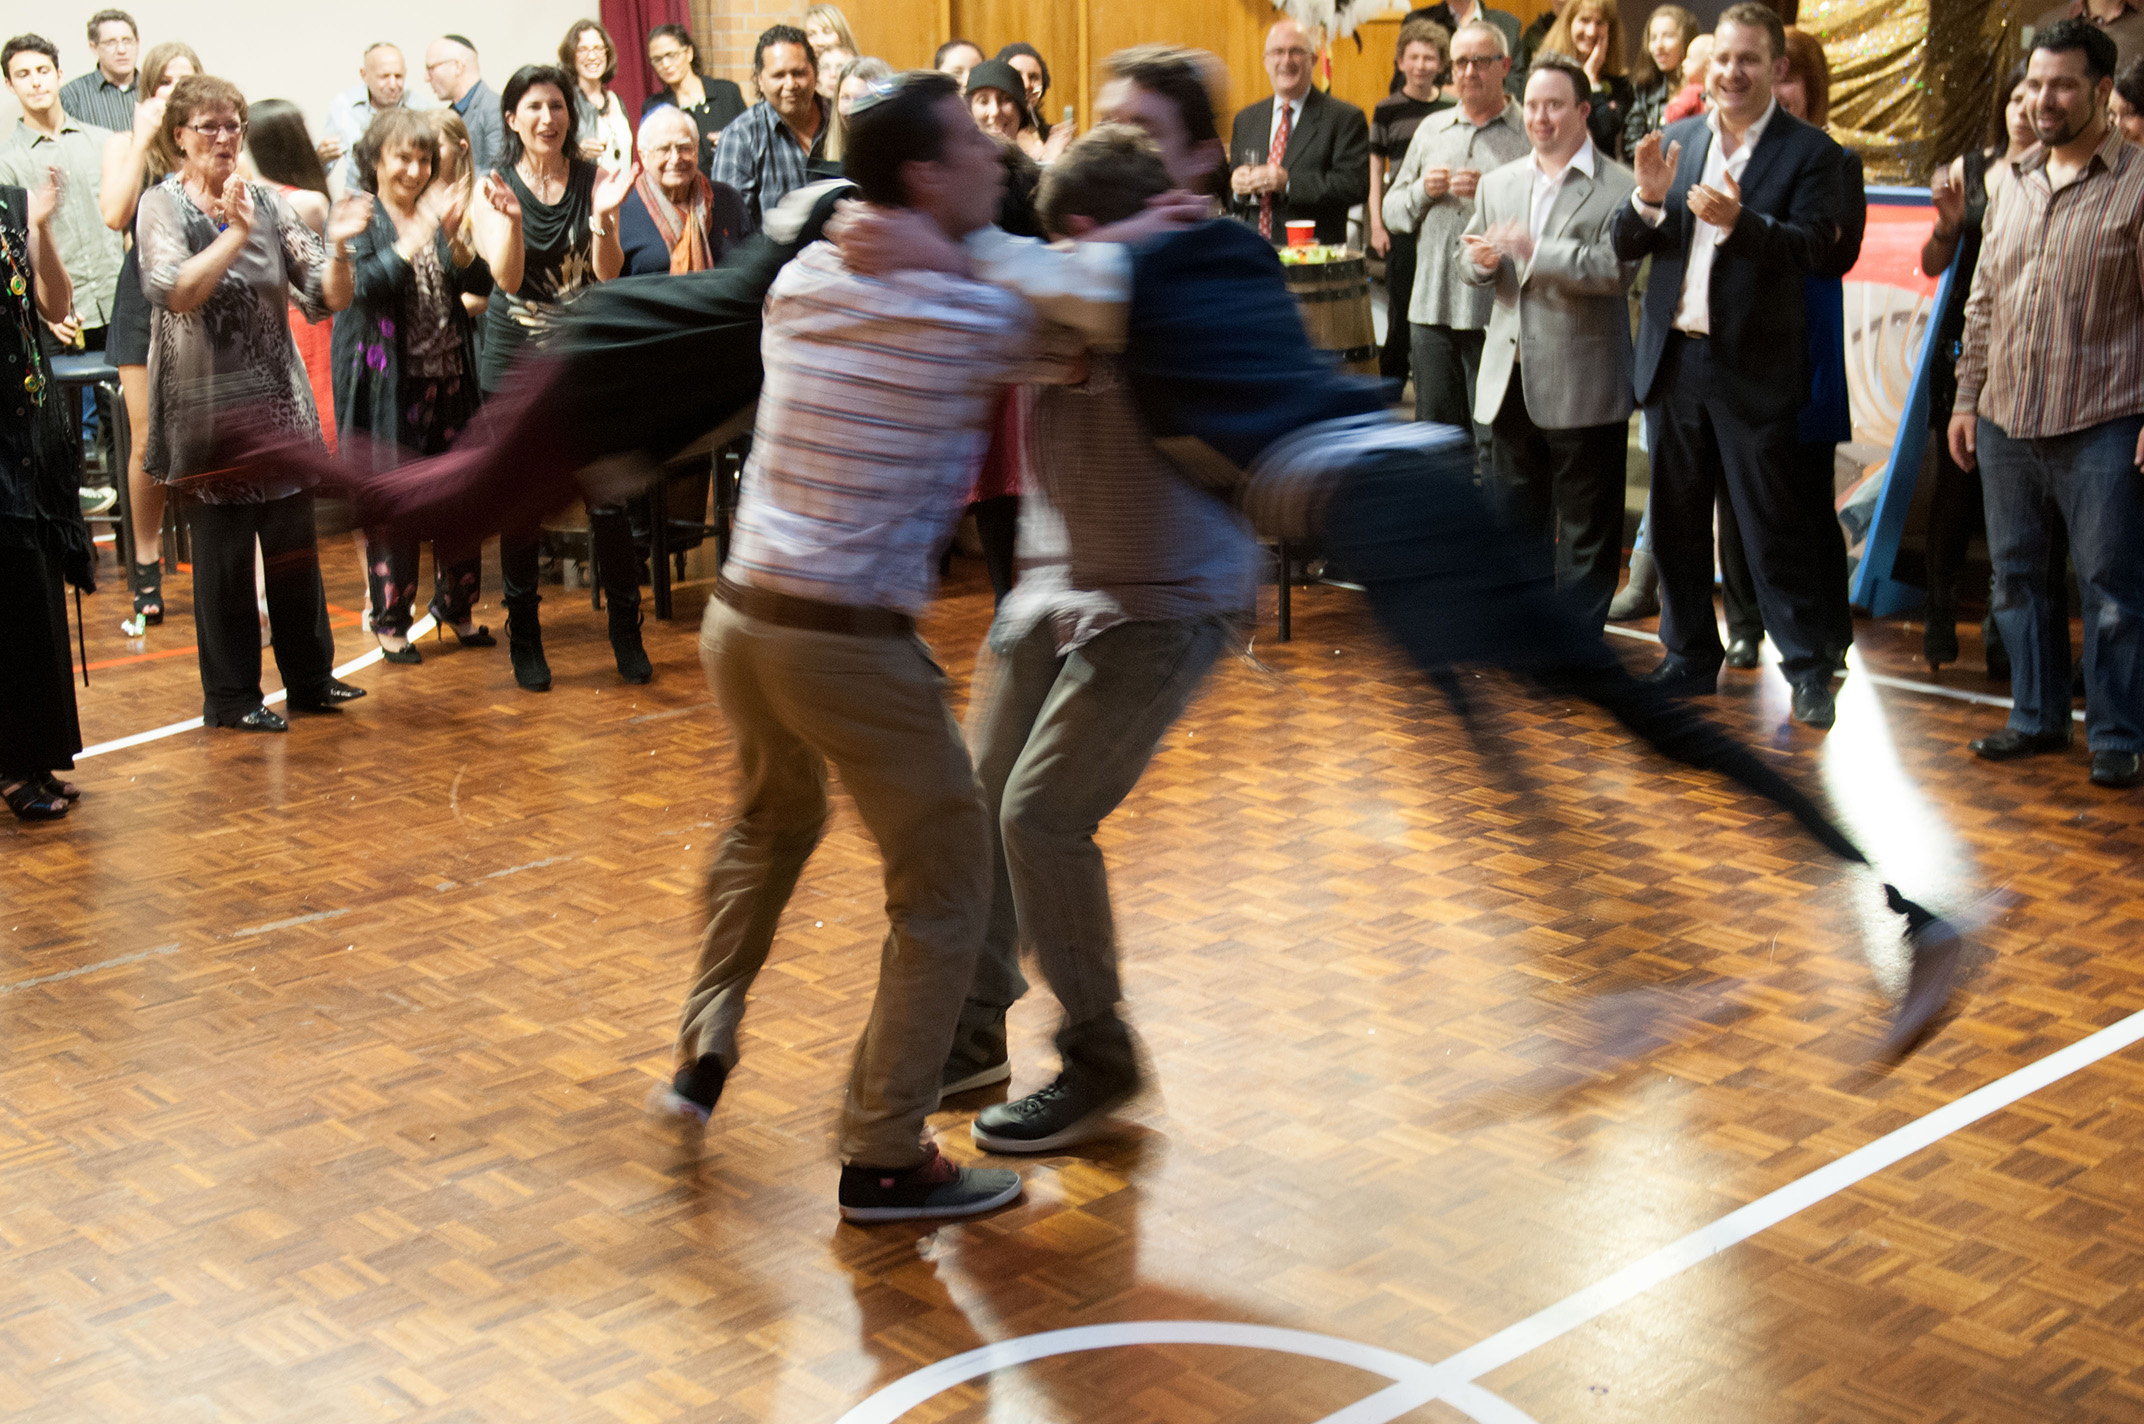 Dance Kadimah jewish school in Auckland city 108 Greys Ave Auckland. Izaac Bar Mitzvah celebration photographed by Anais Chaine.